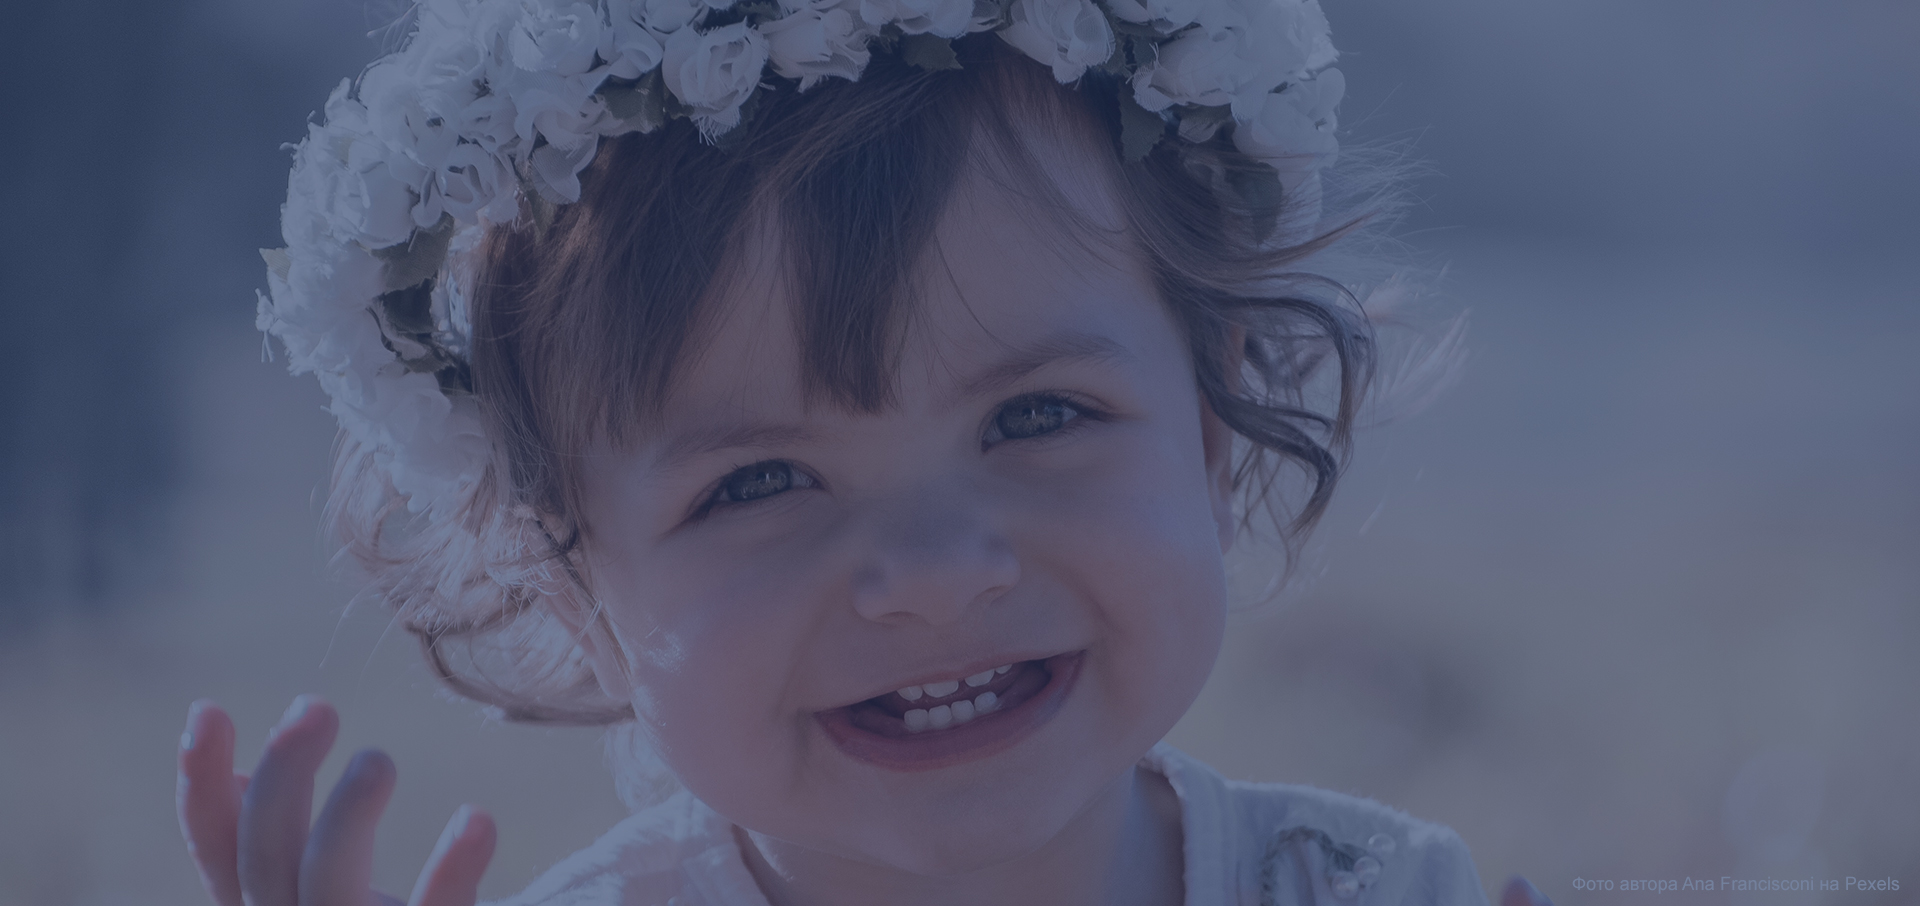 Каждый ребенок поистине уникален